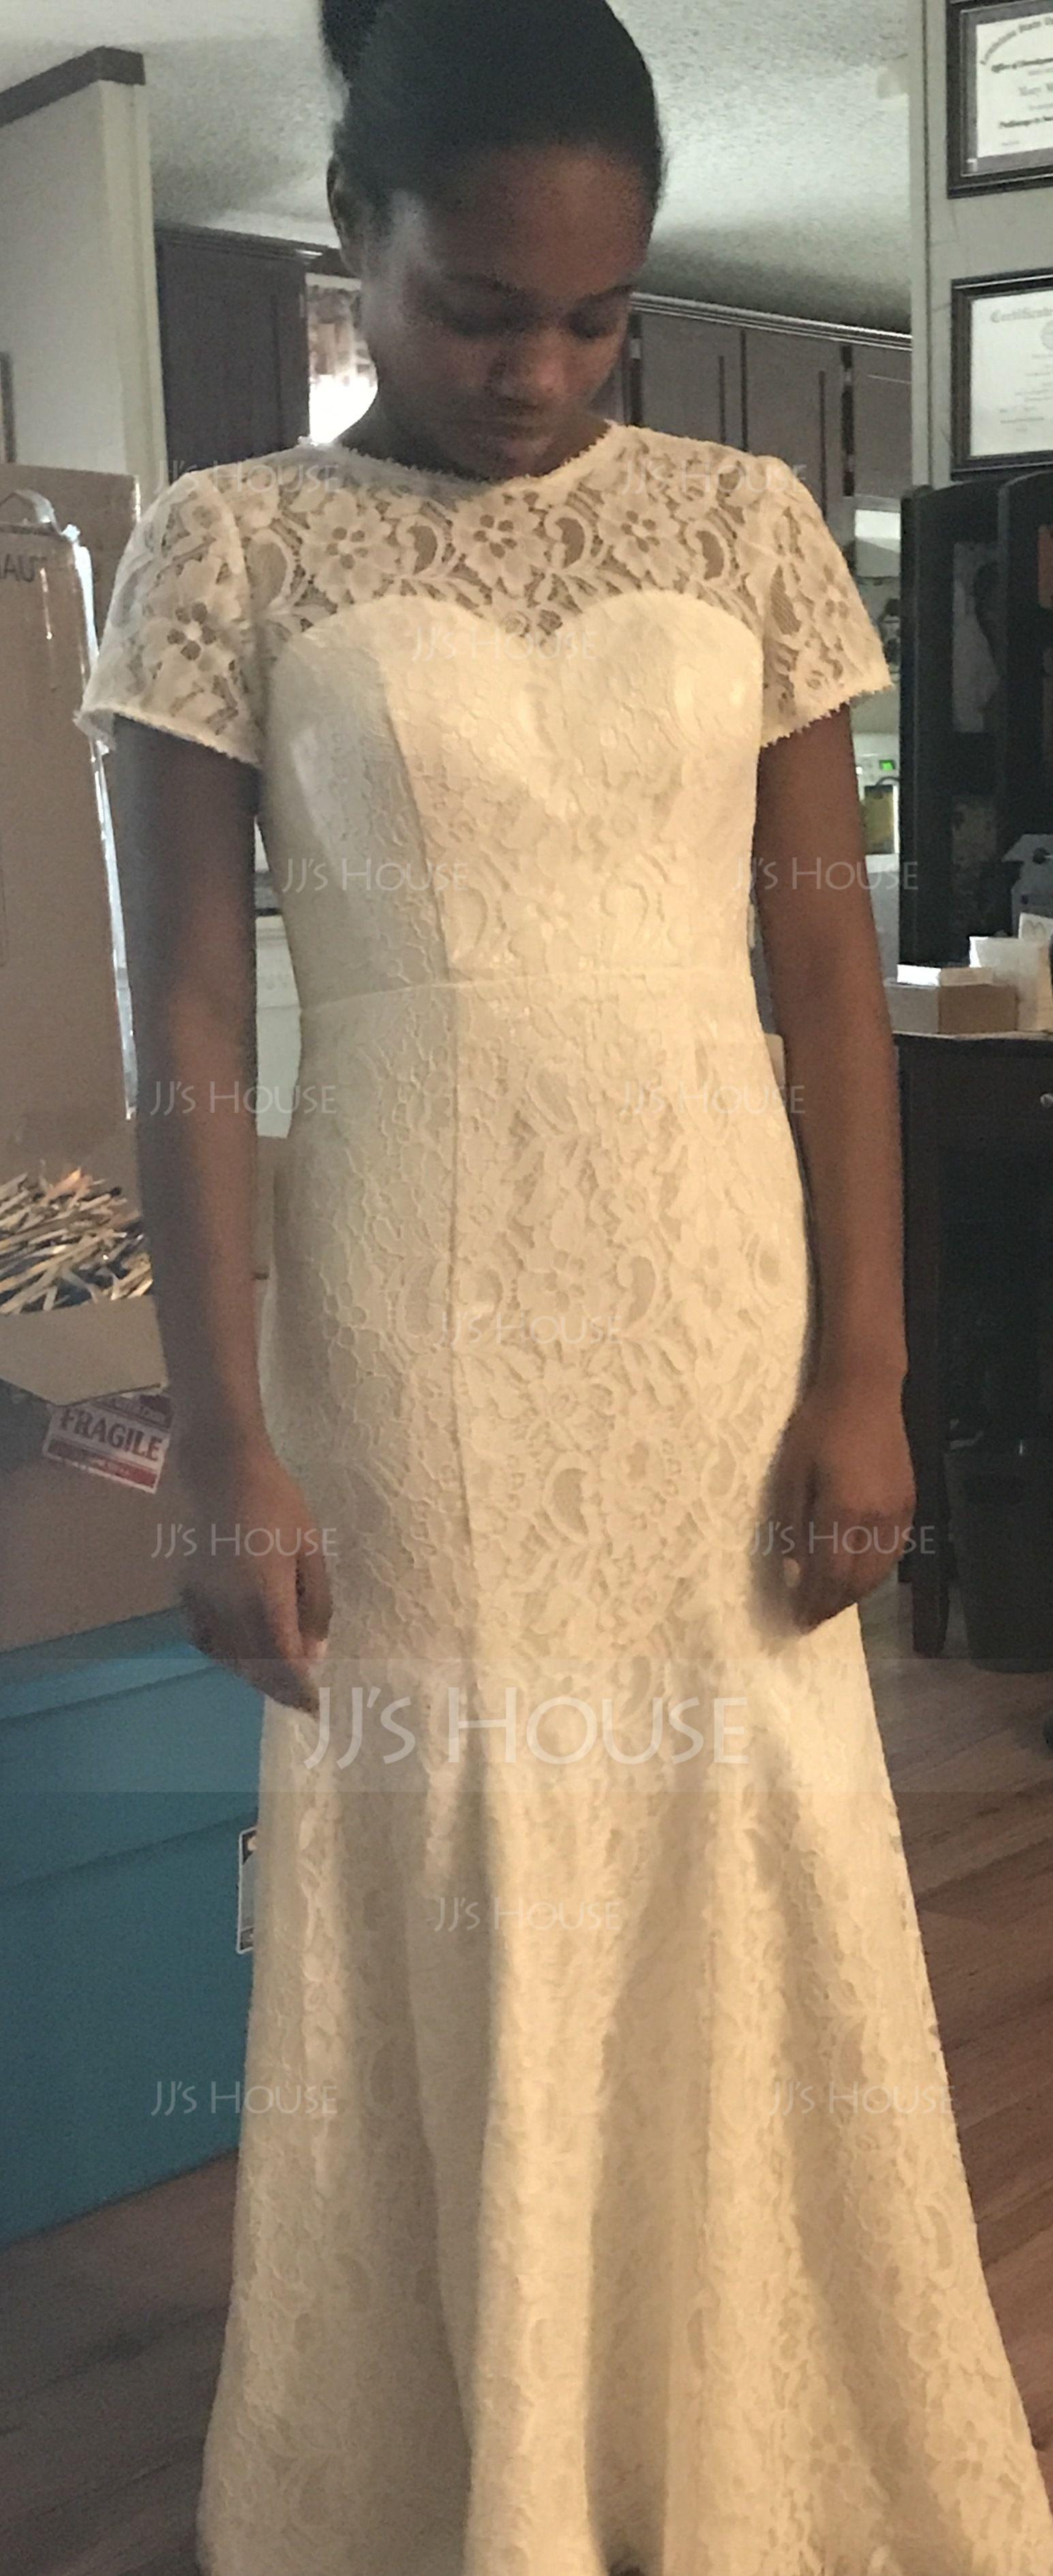 Trumpet/Mermaid Scoop Neck Floor-Length Lace Mother of the Bride Dress (008056831)